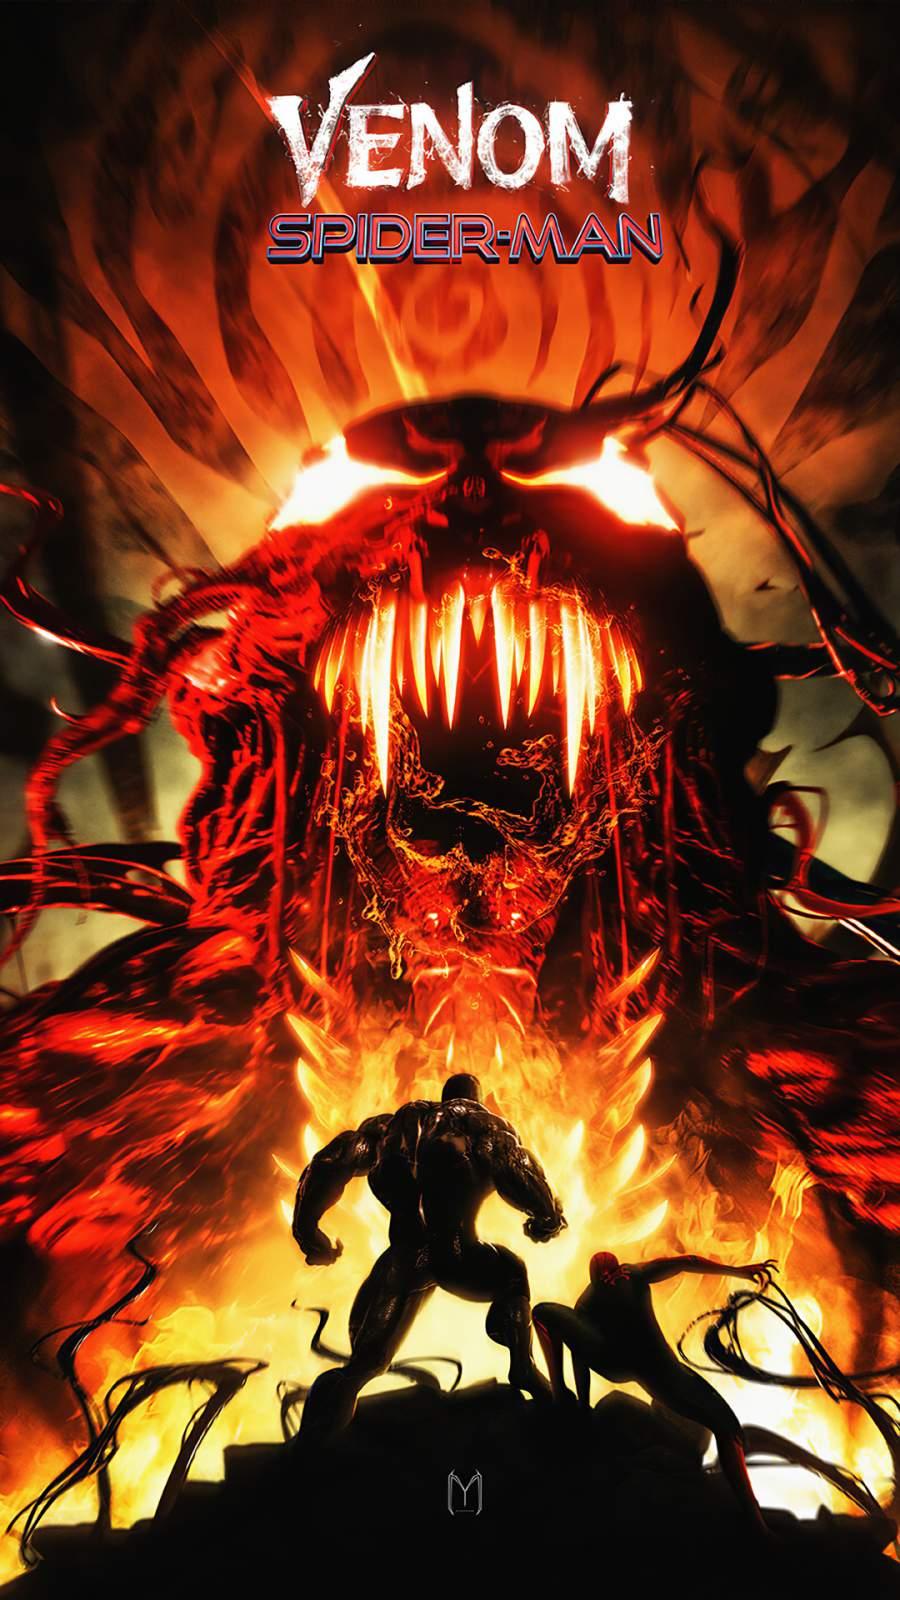 Venom 2 Poster iPhone Wallpaper